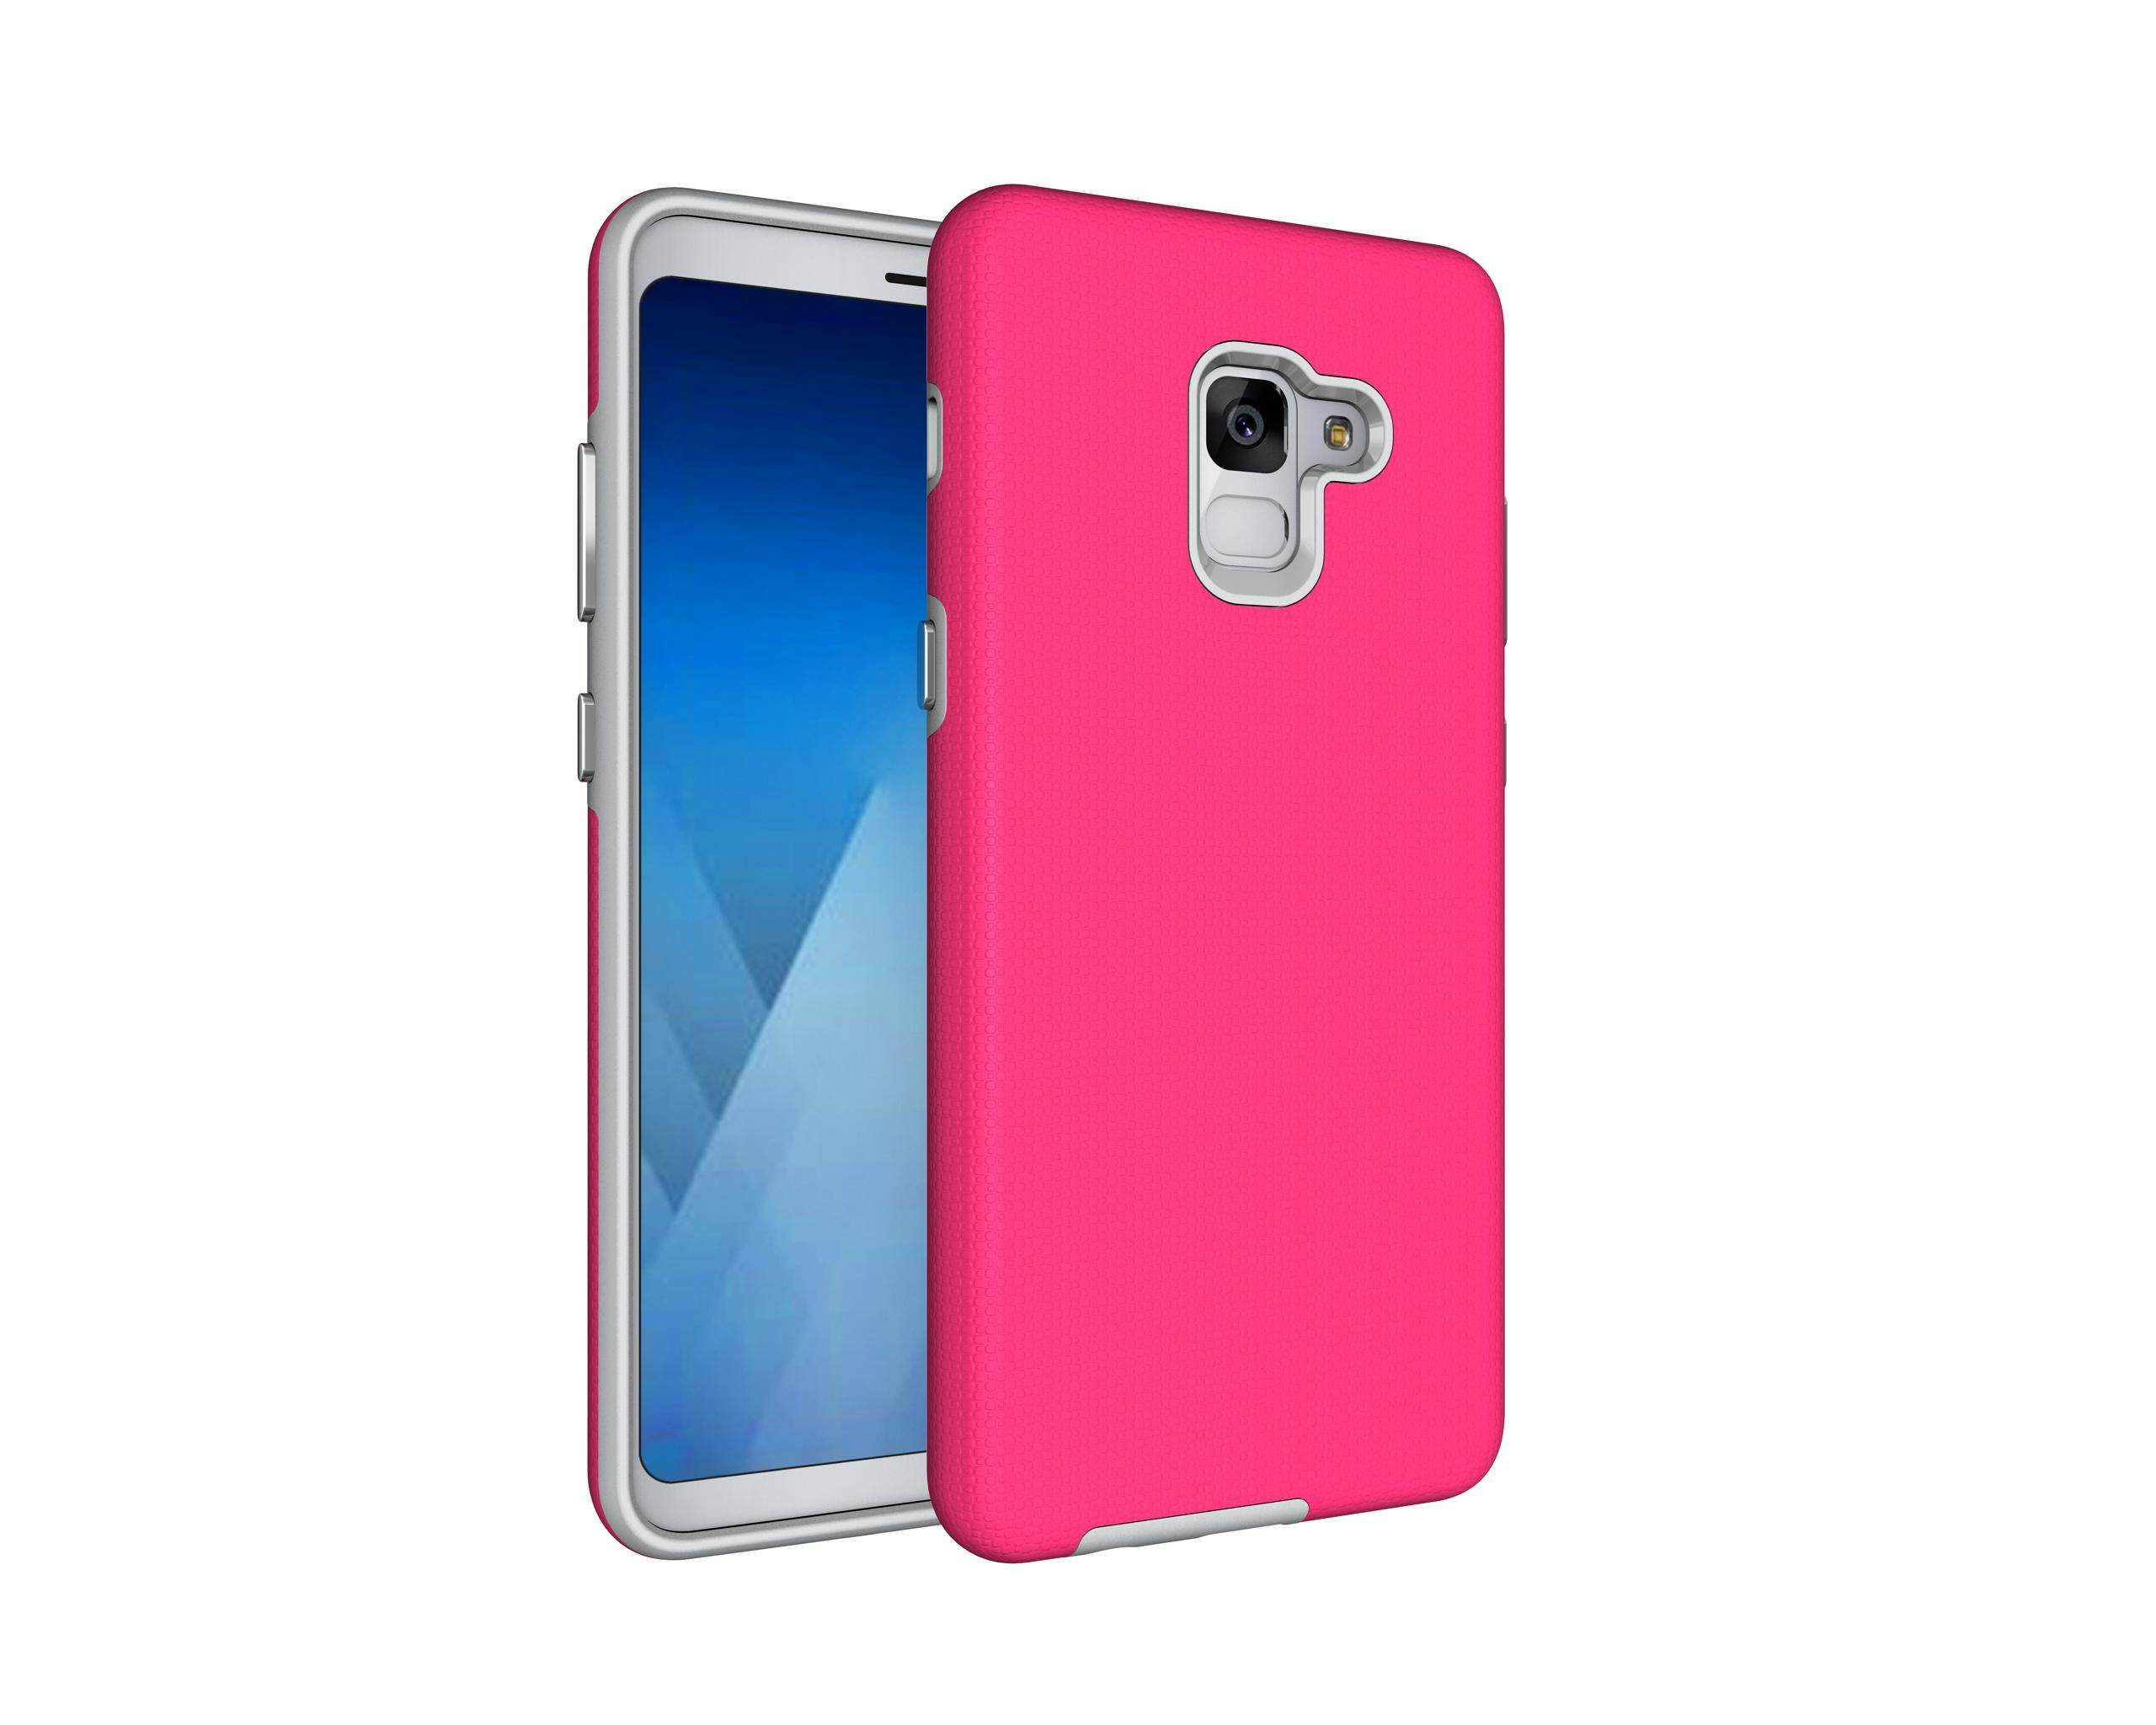 Lenovo Rocstar A319 Dual Sim Hitam Referensi Daftar Harga Terbaru A369i On 4 Gb 4gb Source Akabeila Armor Tpu Pc Cover Phone Case For Samsung Galaxy A7 2018 Duos With